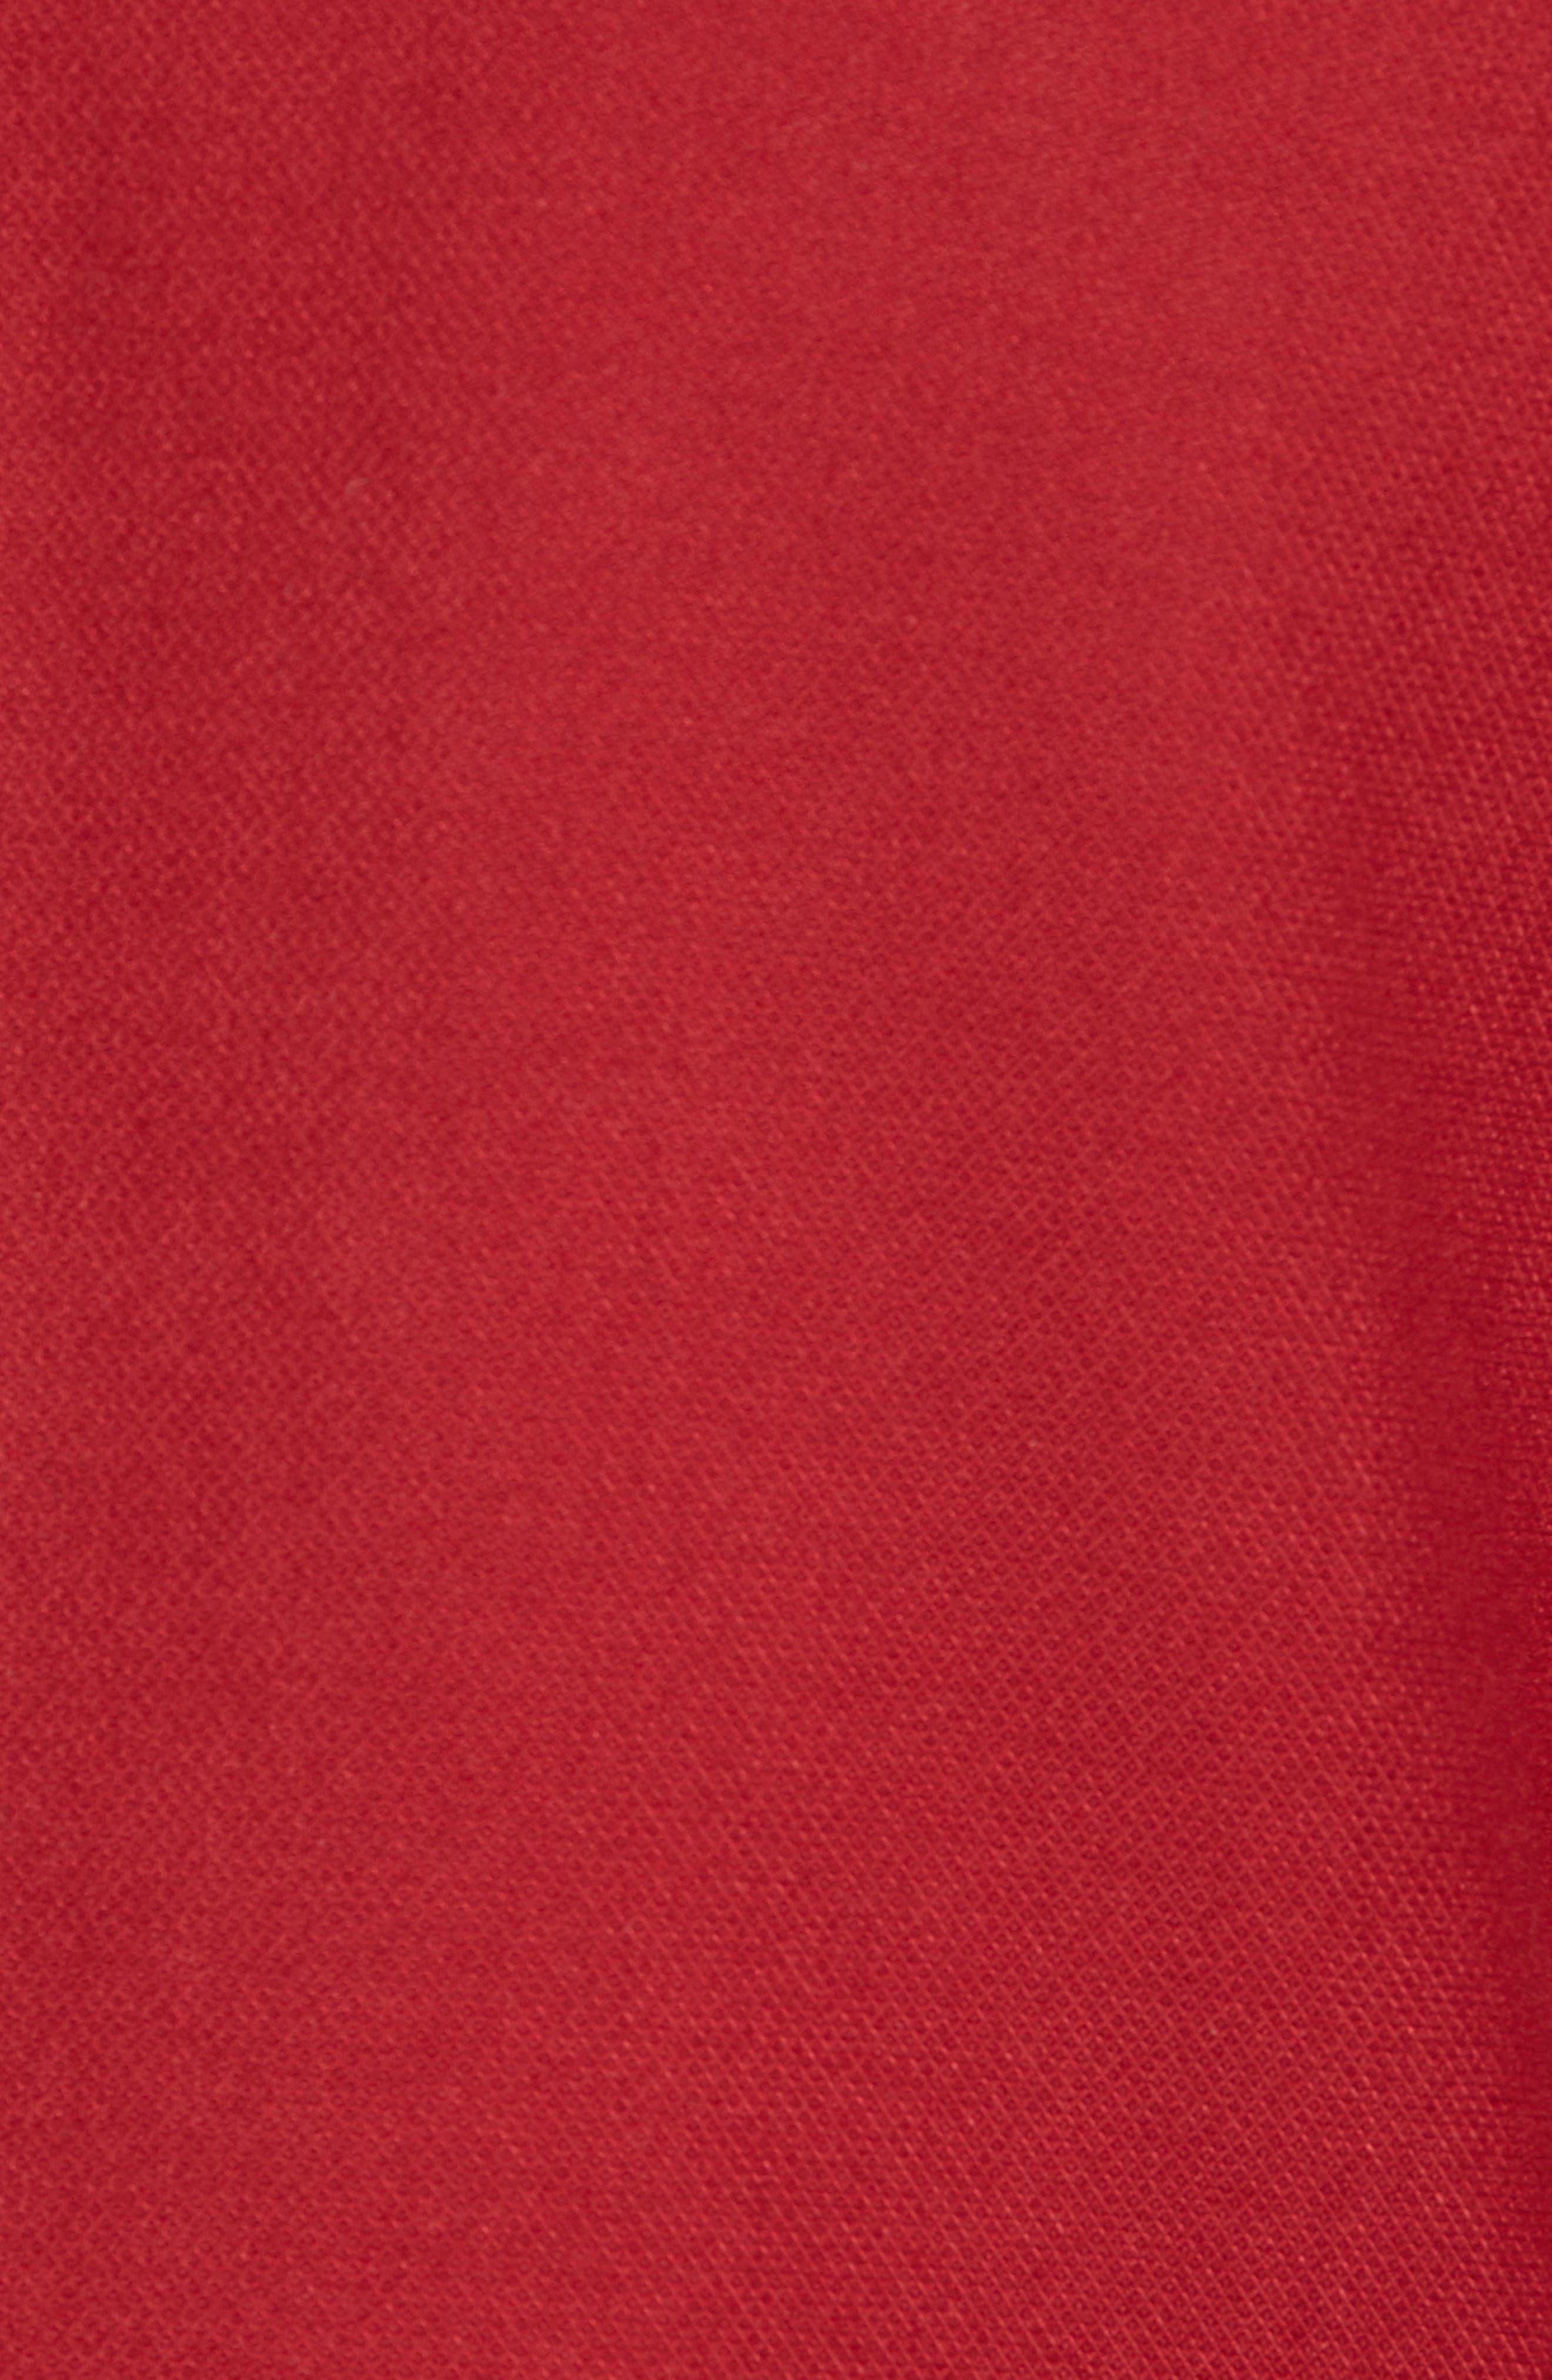 Skinny Fit Suit Jacket,                             Alternate thumbnail 6, color,                             600